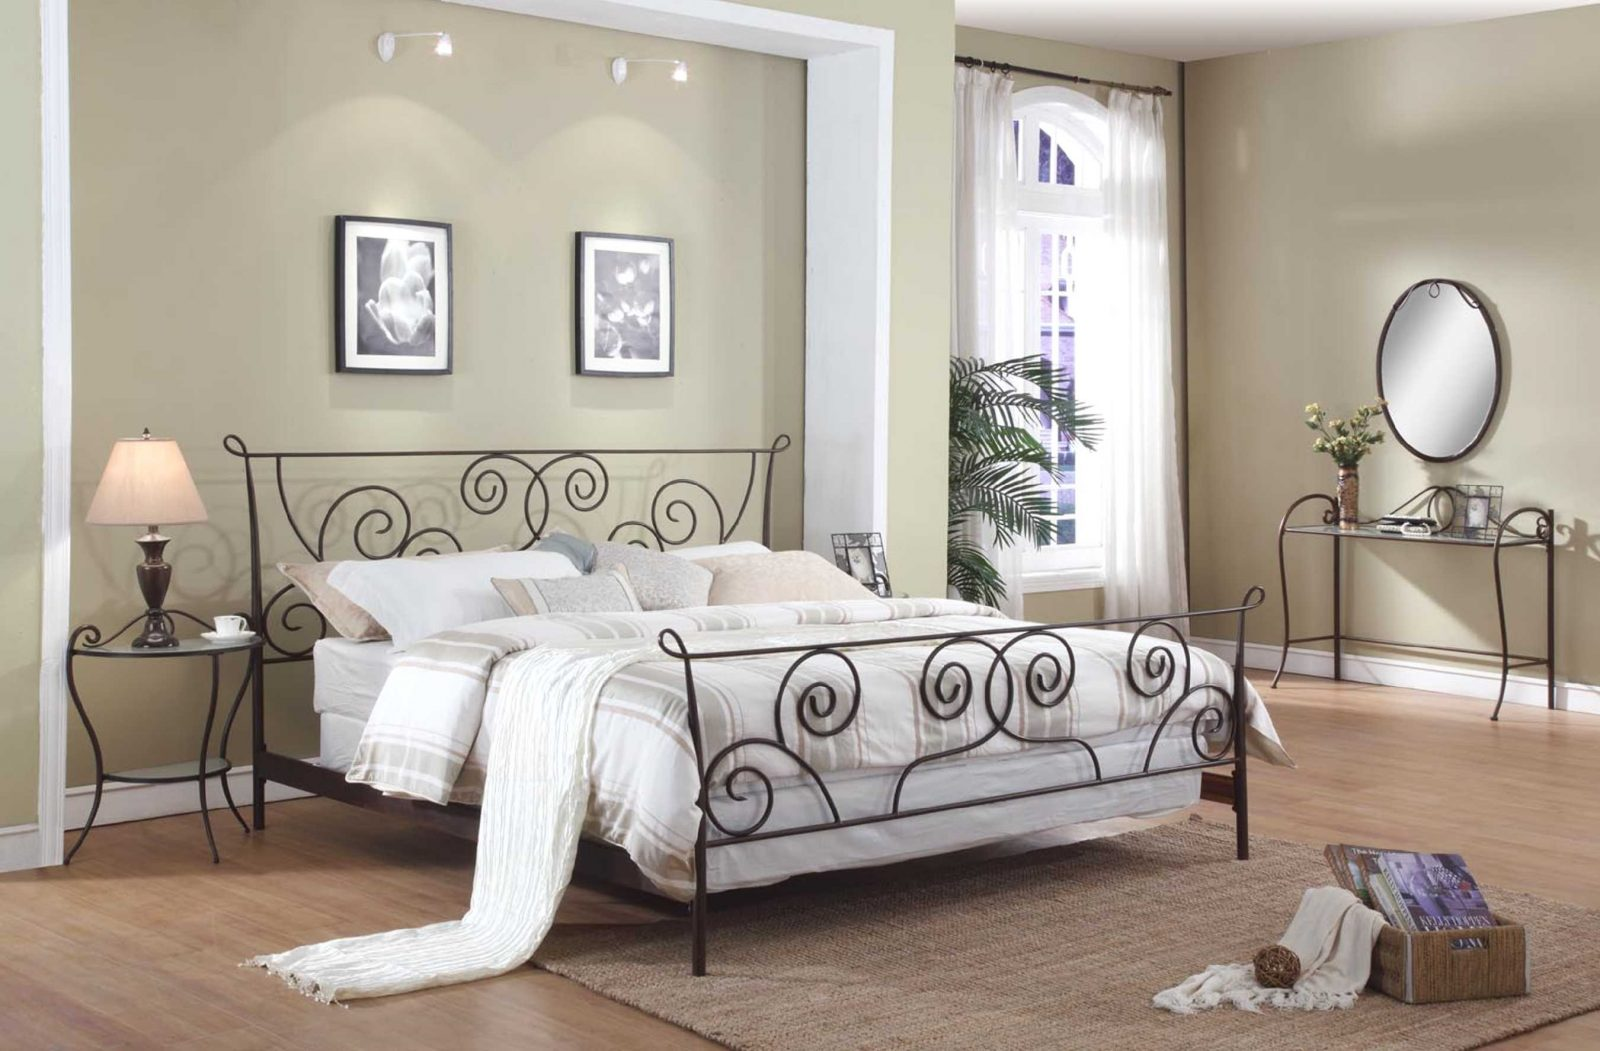 Camas para dormitorios clásicos